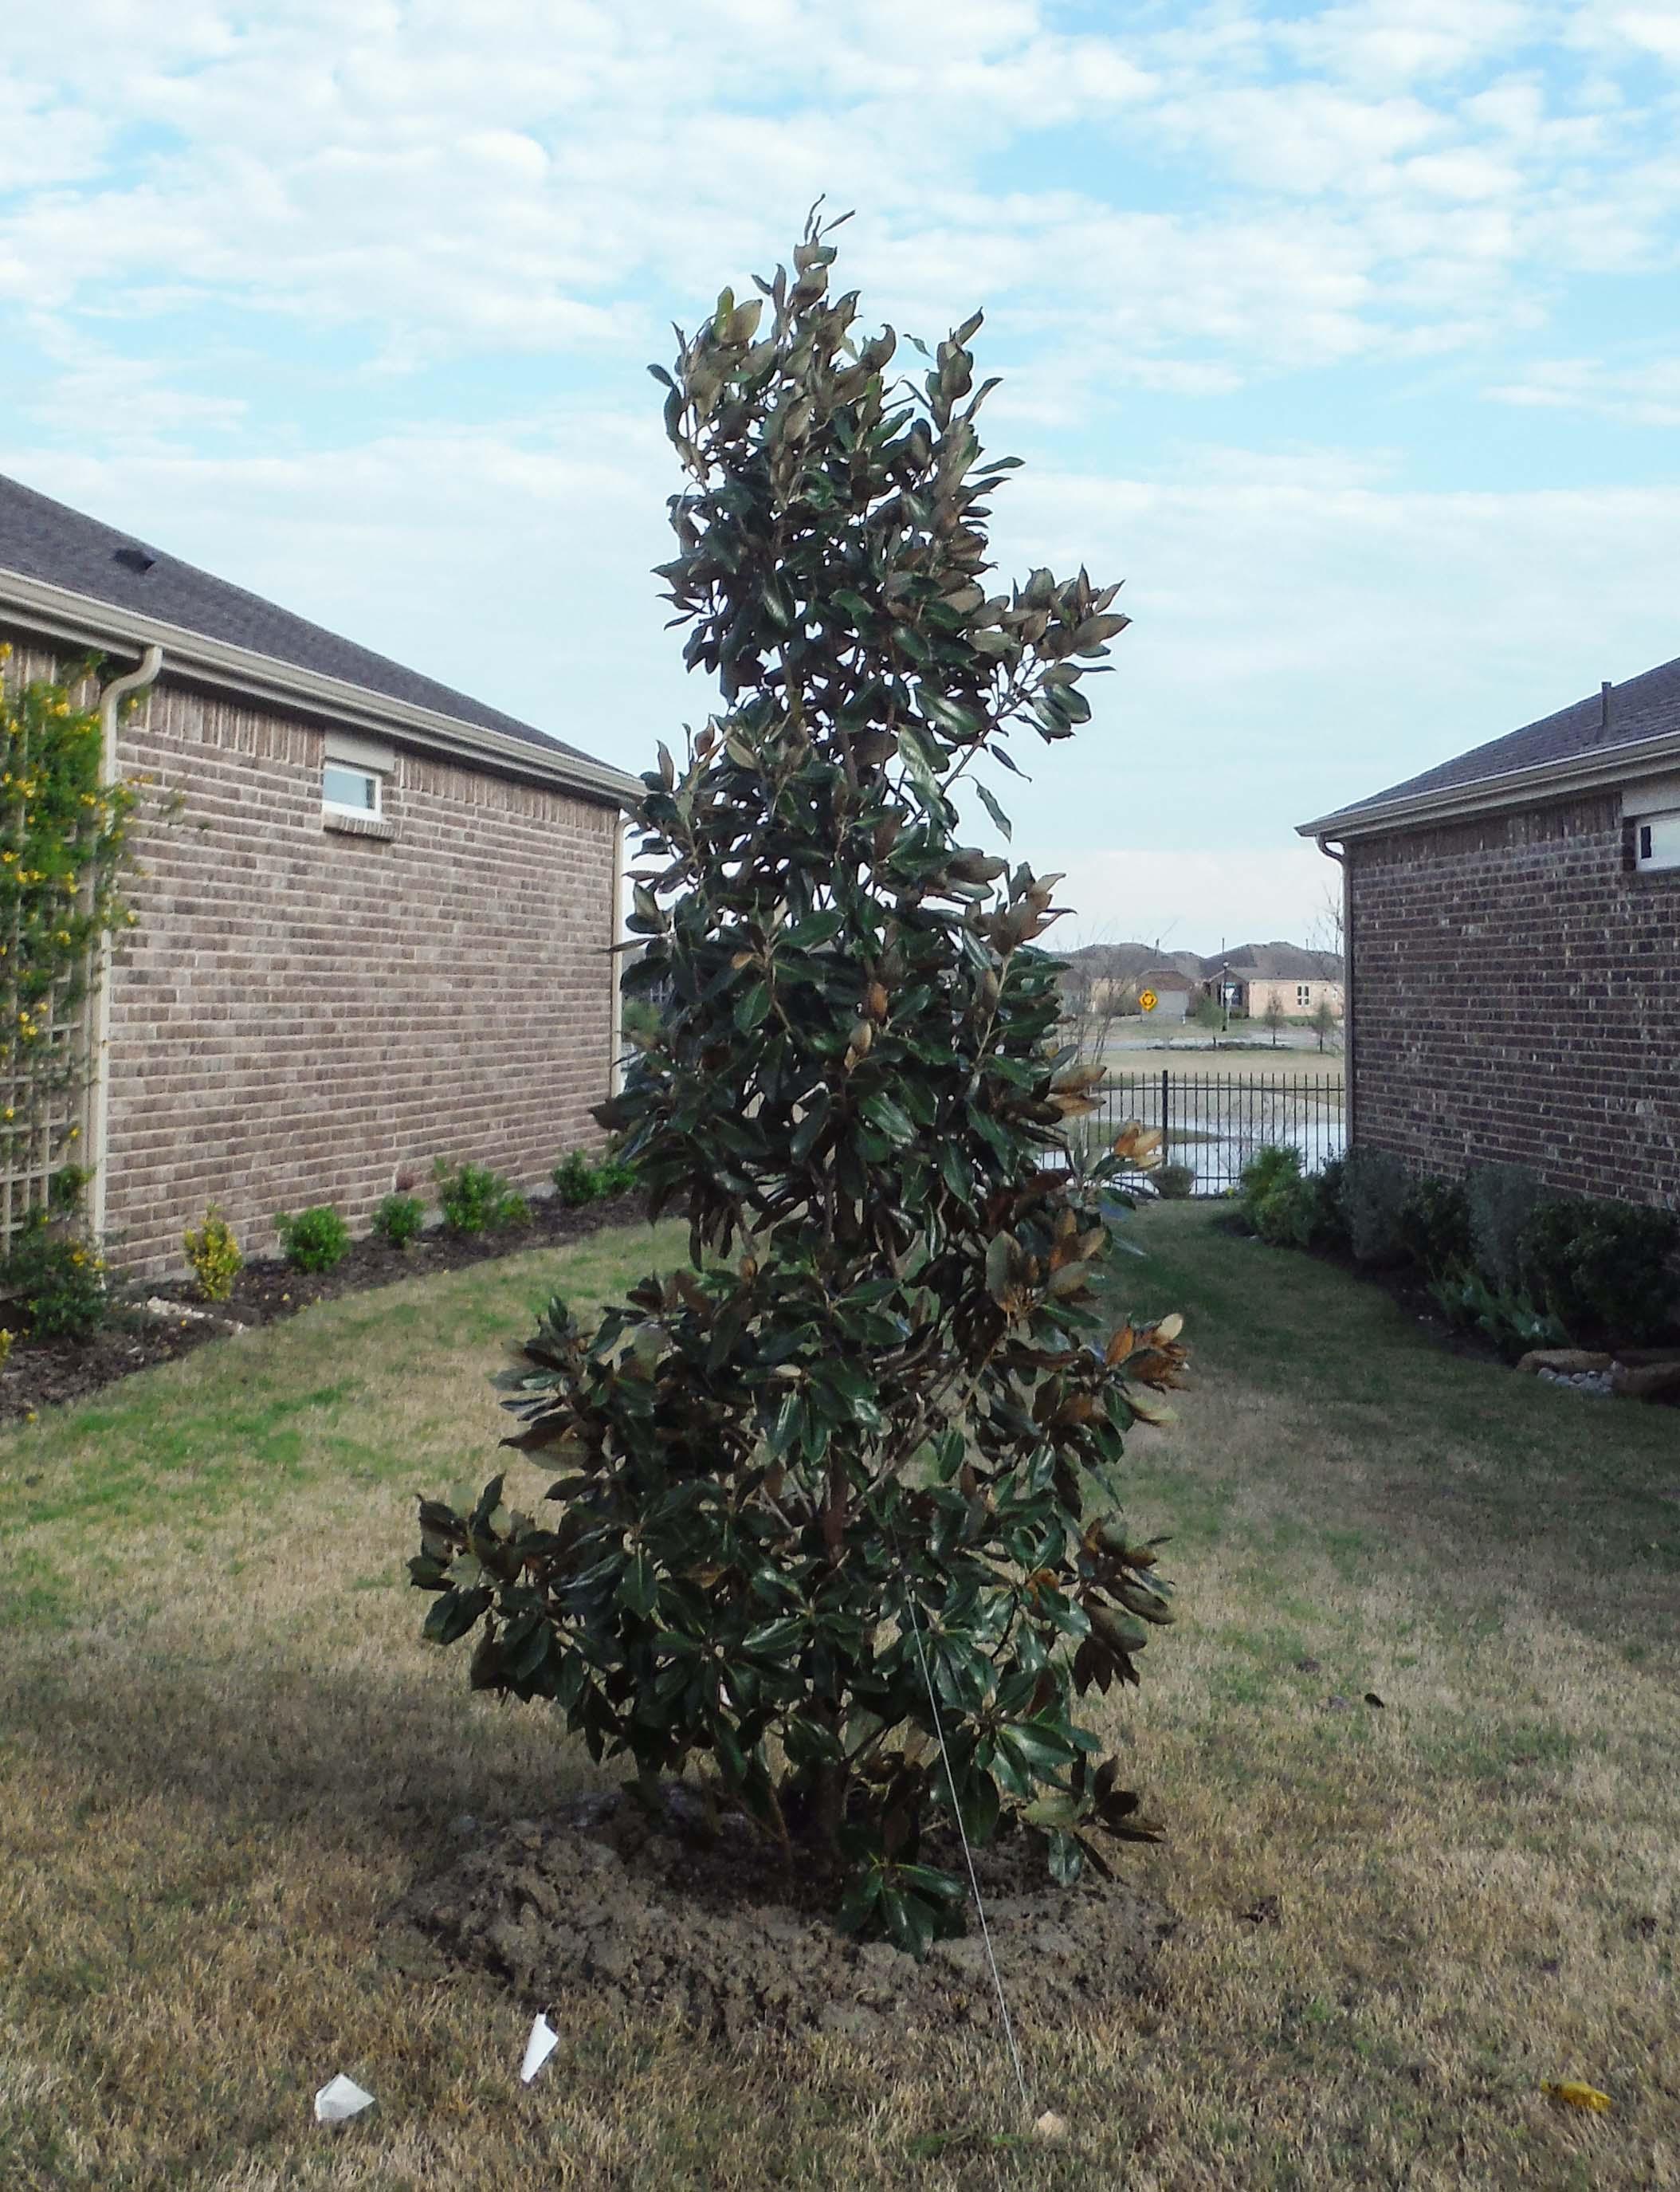 Little Gem Magnolia planted by Treeland Nursery between 2 houses.